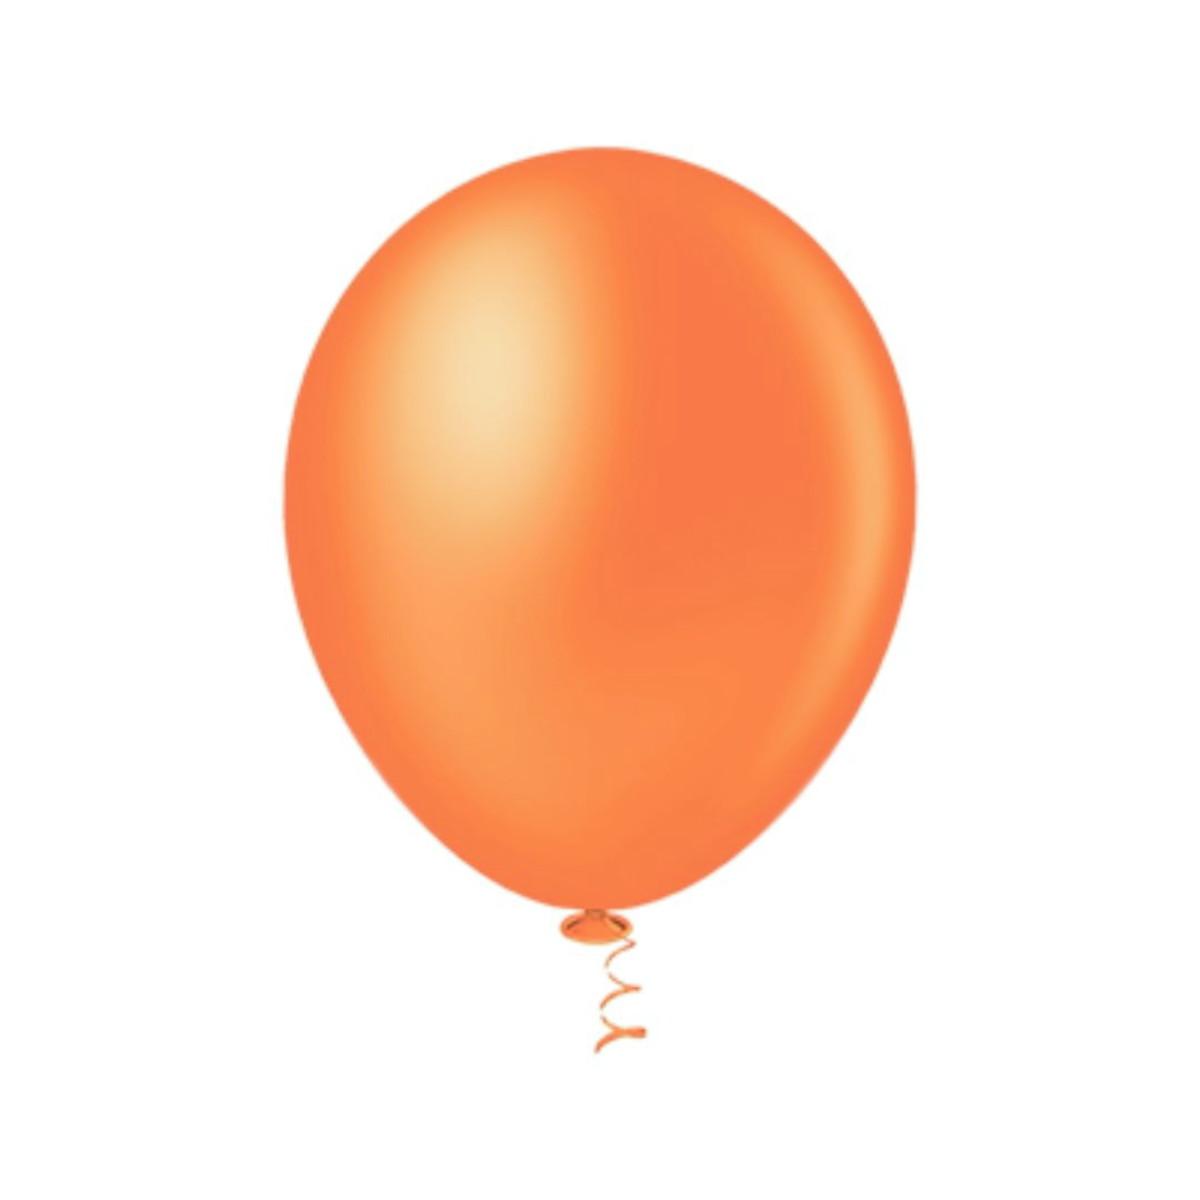 50 Unid Balão Bexiga Látex Laranja Tamanho 7